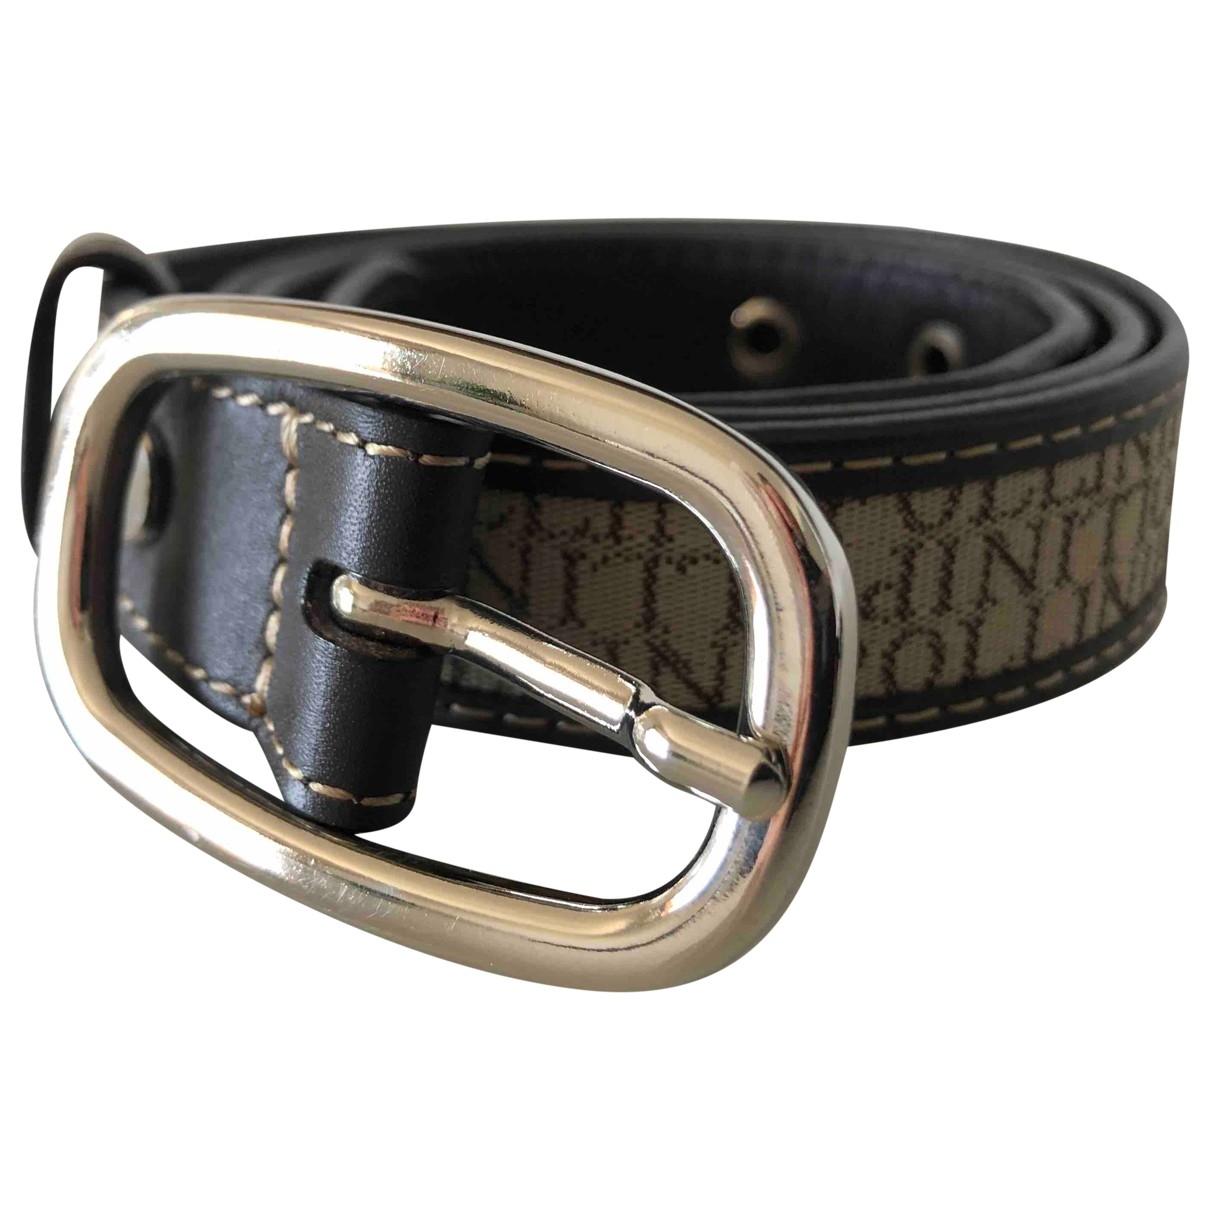 Cinturon de Cuero Pollini